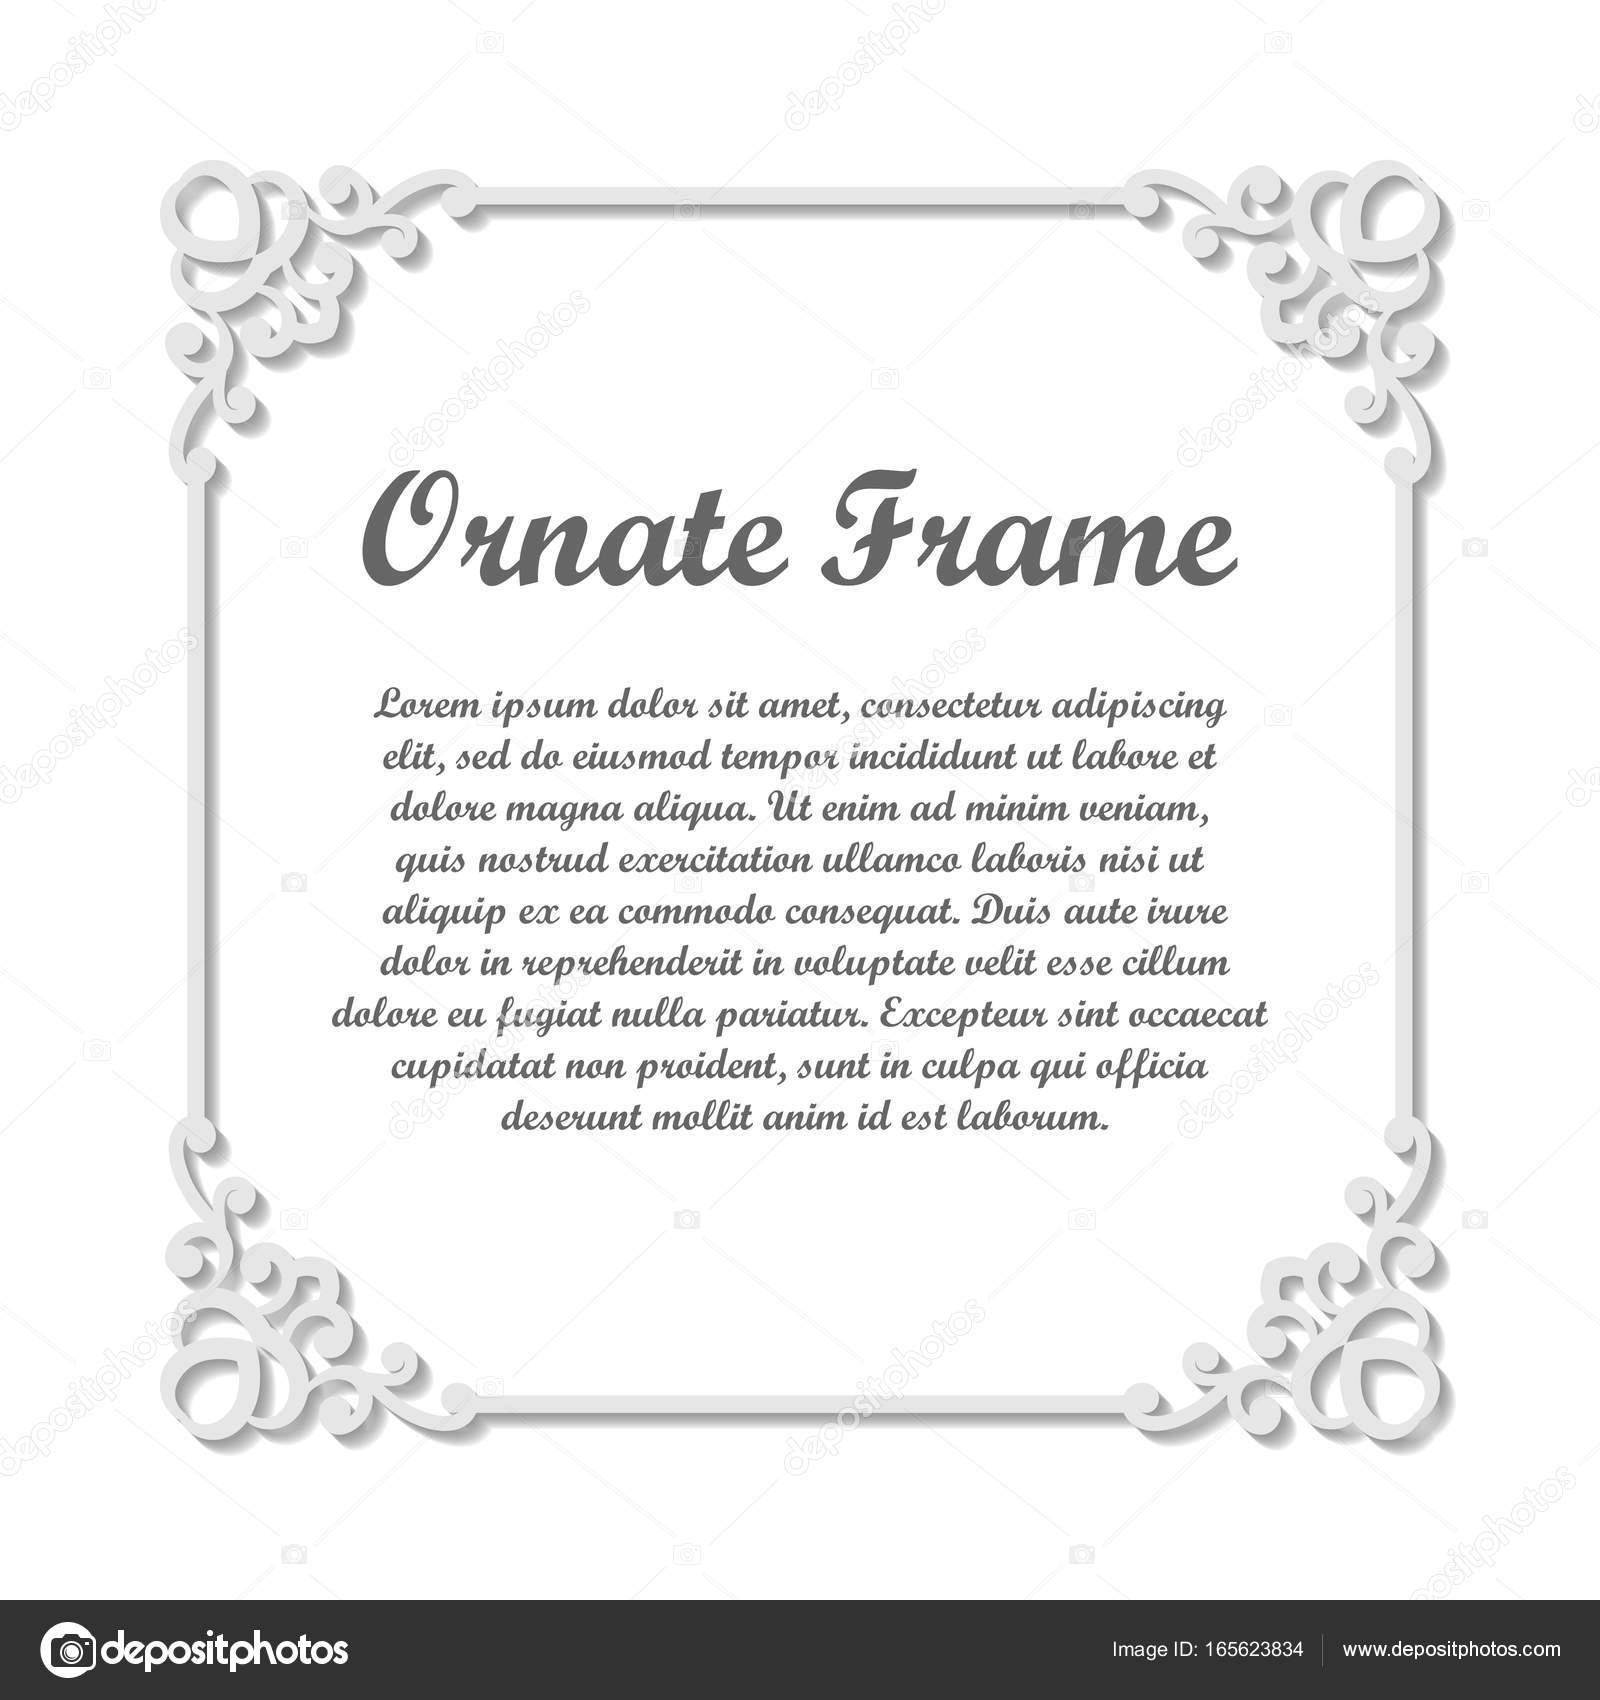 Fine Floral Ornamental Border Lace Decor Elegant Art For Birthday And Greeting Card Wedding Invitation Ornate Corners